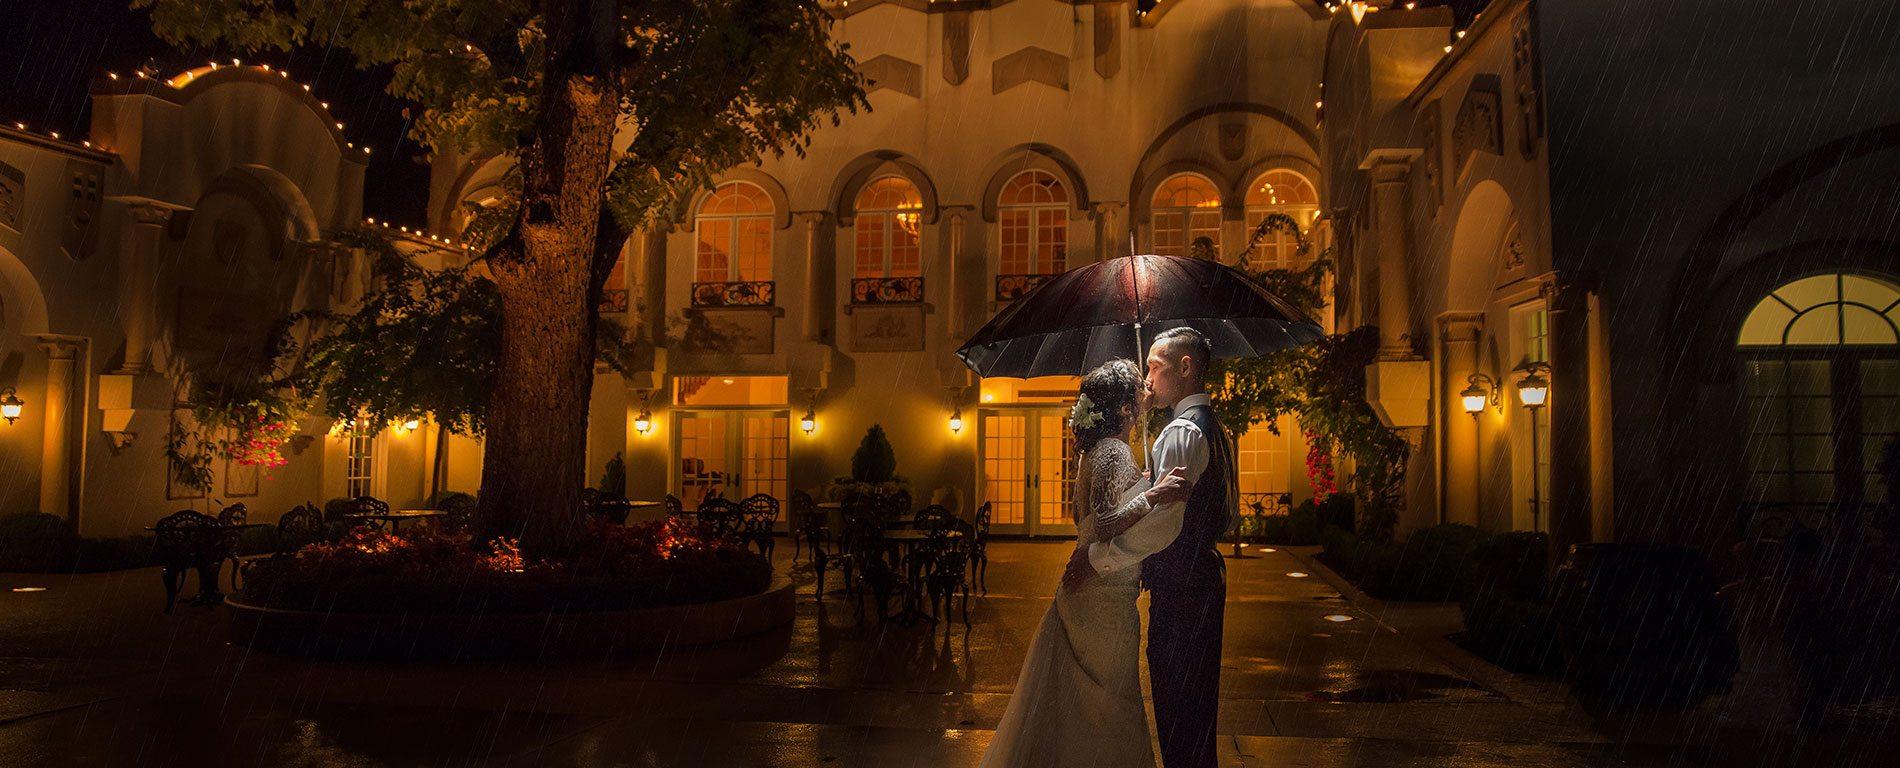 morais-vinyards-and-winery-home-slider-outside-parasol-kissing-rain Home